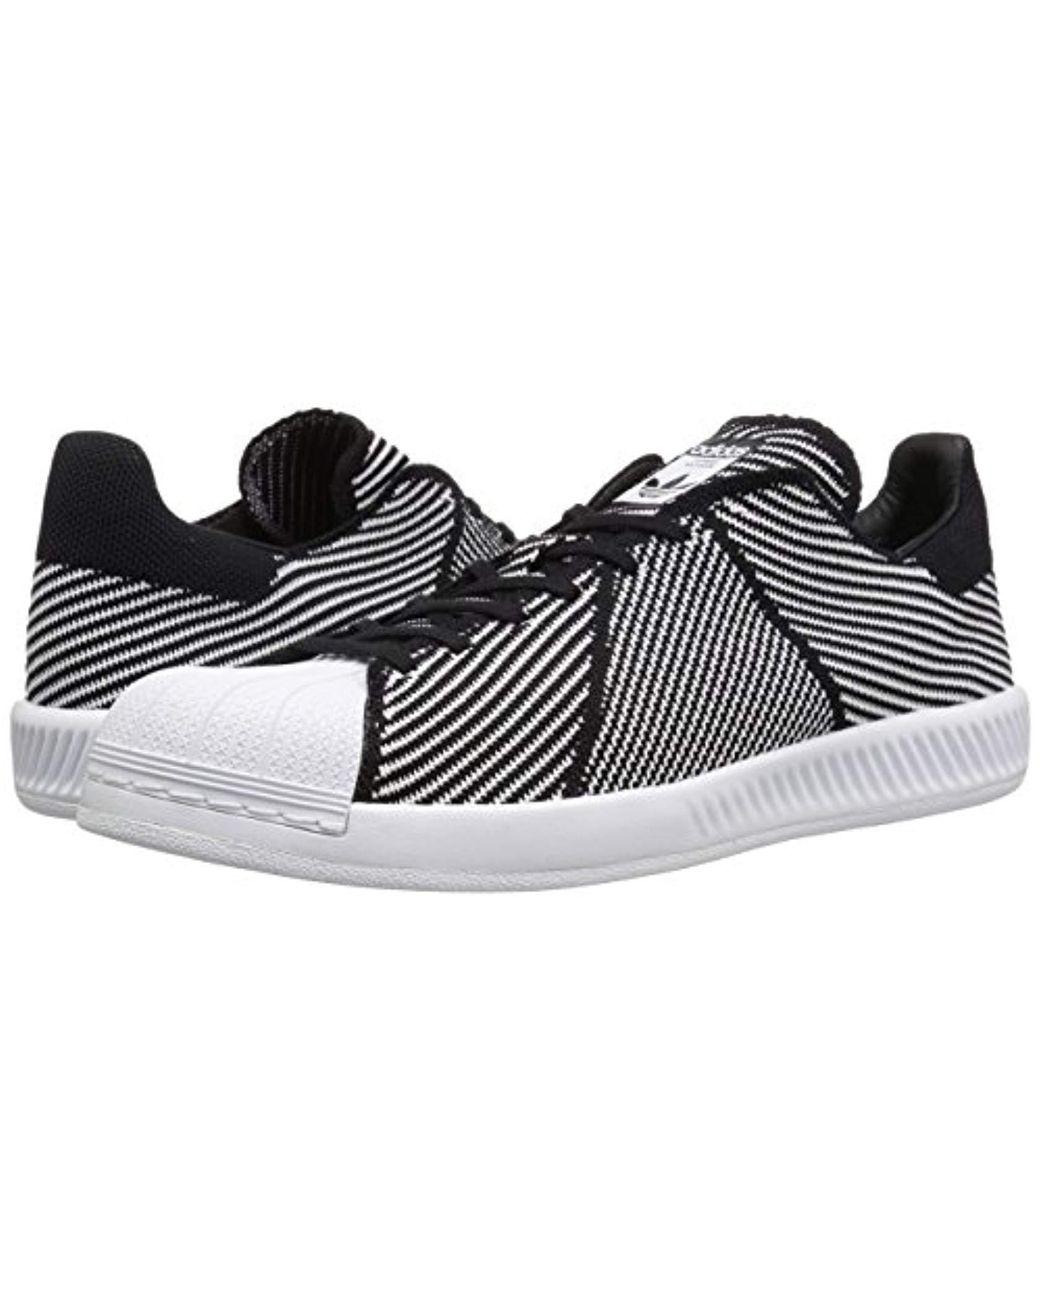 cbe88f675 Lyst - adidas Originals Superstar Bounce Pk Fashion Sneaker in Black for Men